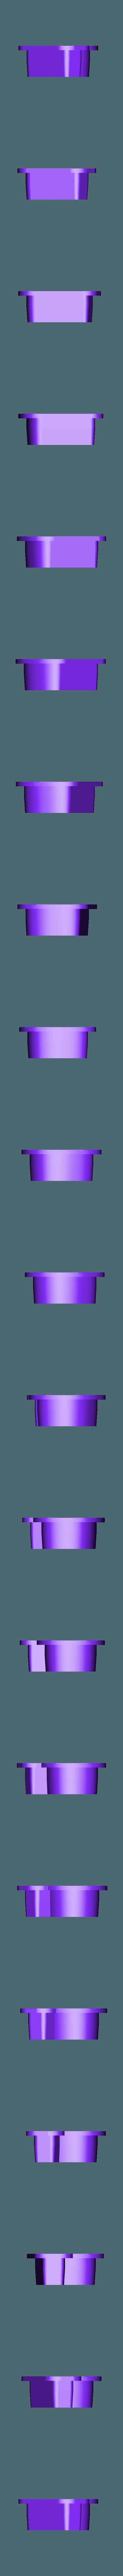 JAUNE grand P.STL Download STL file Patrol Punch (Paw Patrol) • 3D print object, Chris-tropherIlParait